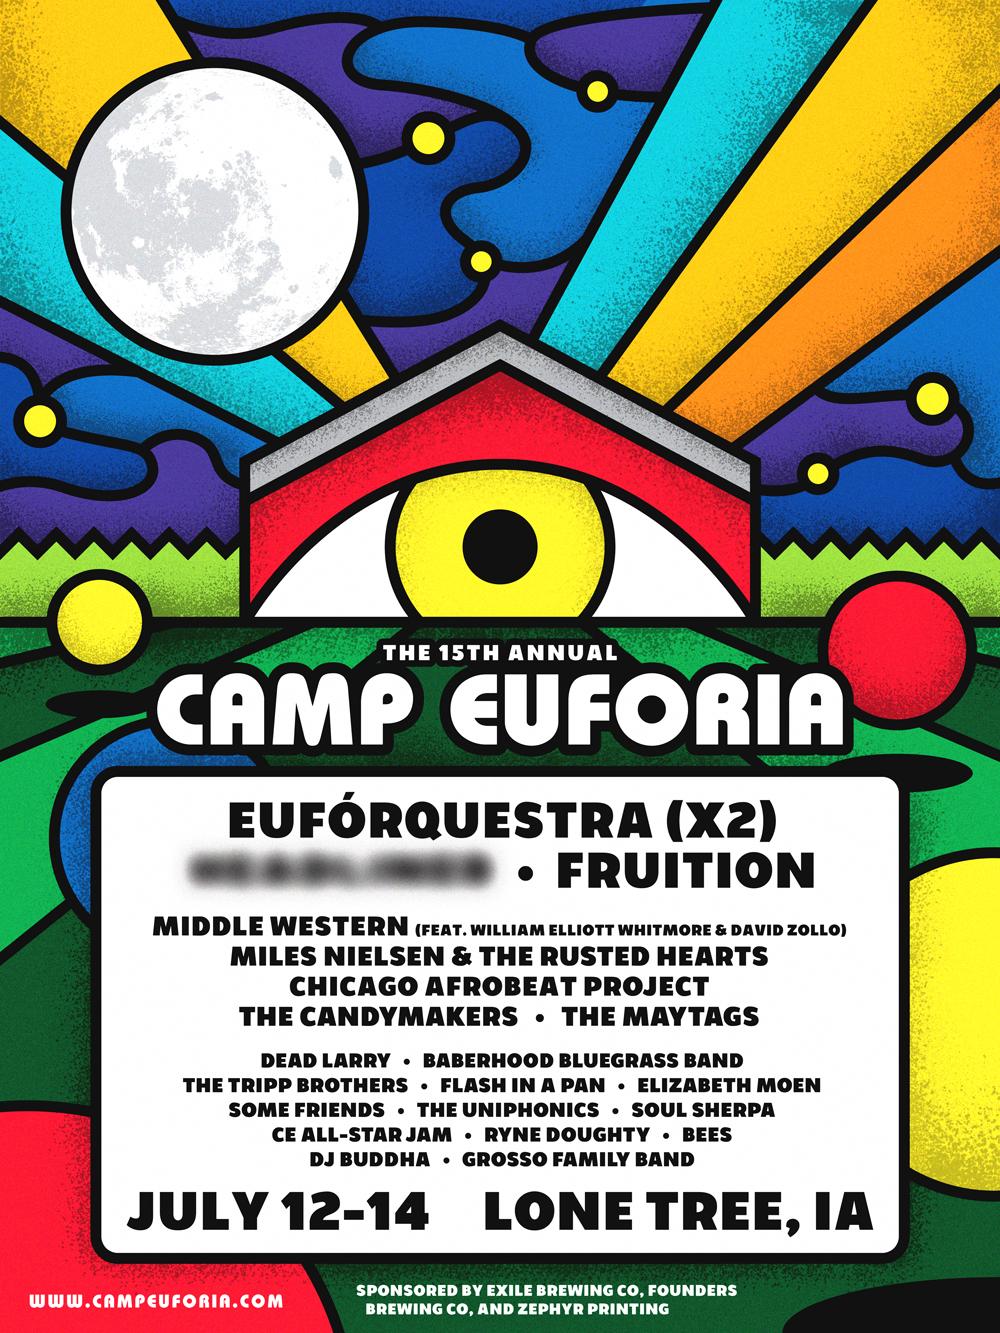 campeuforia-poster-04.jpg